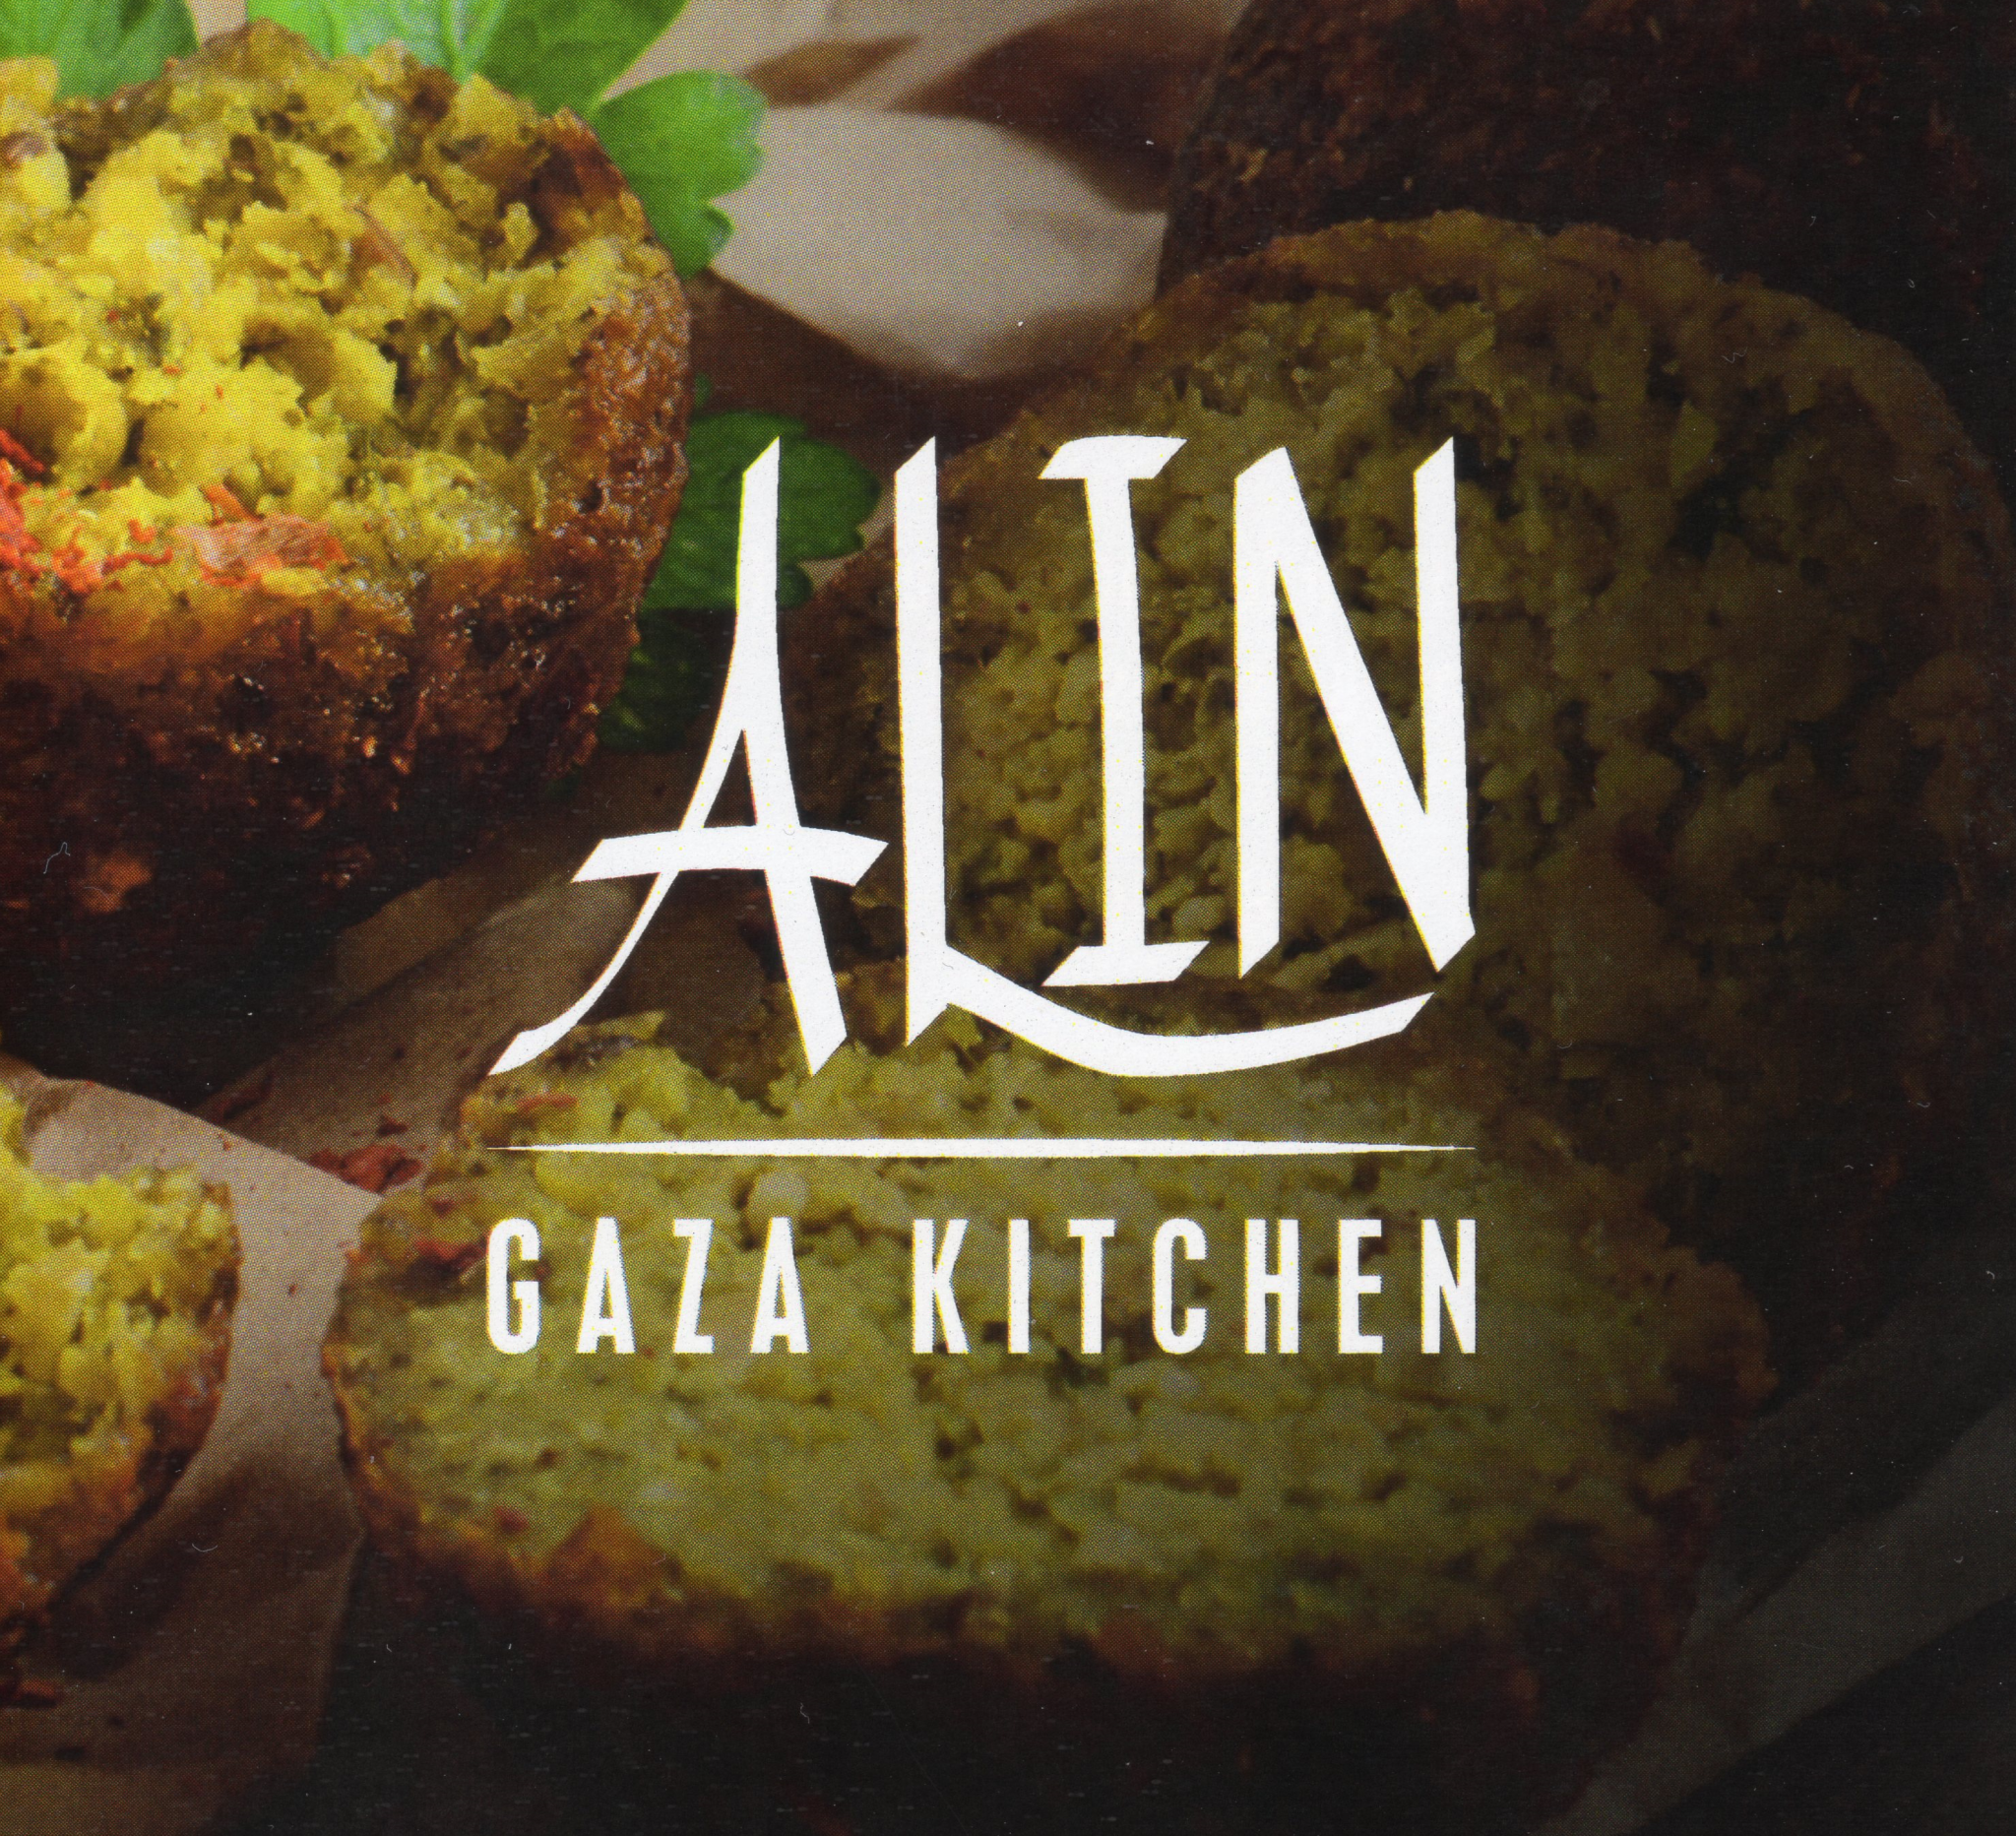 Alin Gaza kitchen logo